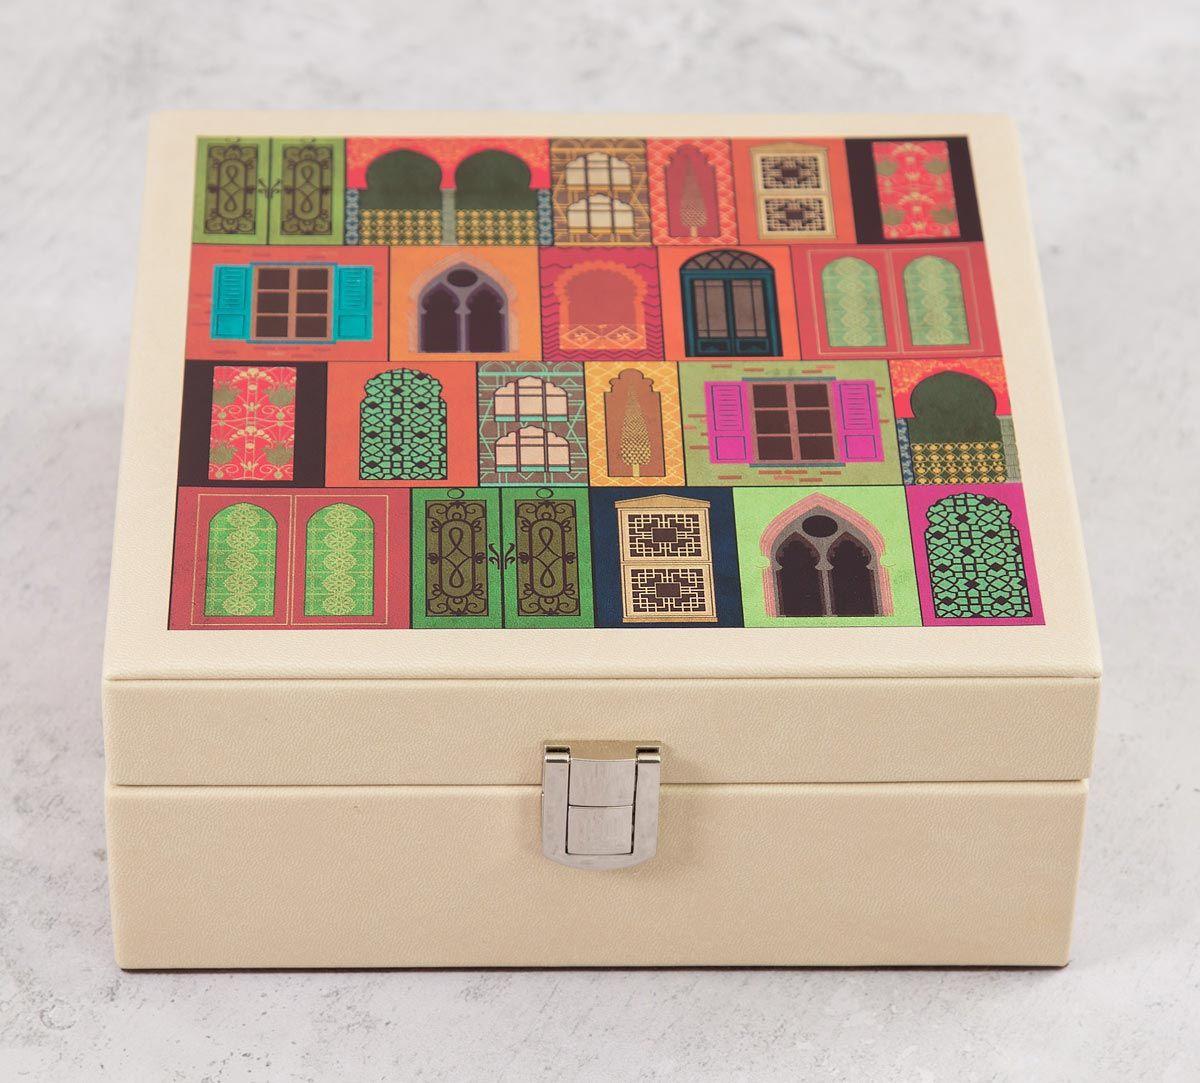 India Circus Mughal Doors Reiteration Leather Jewellery Box